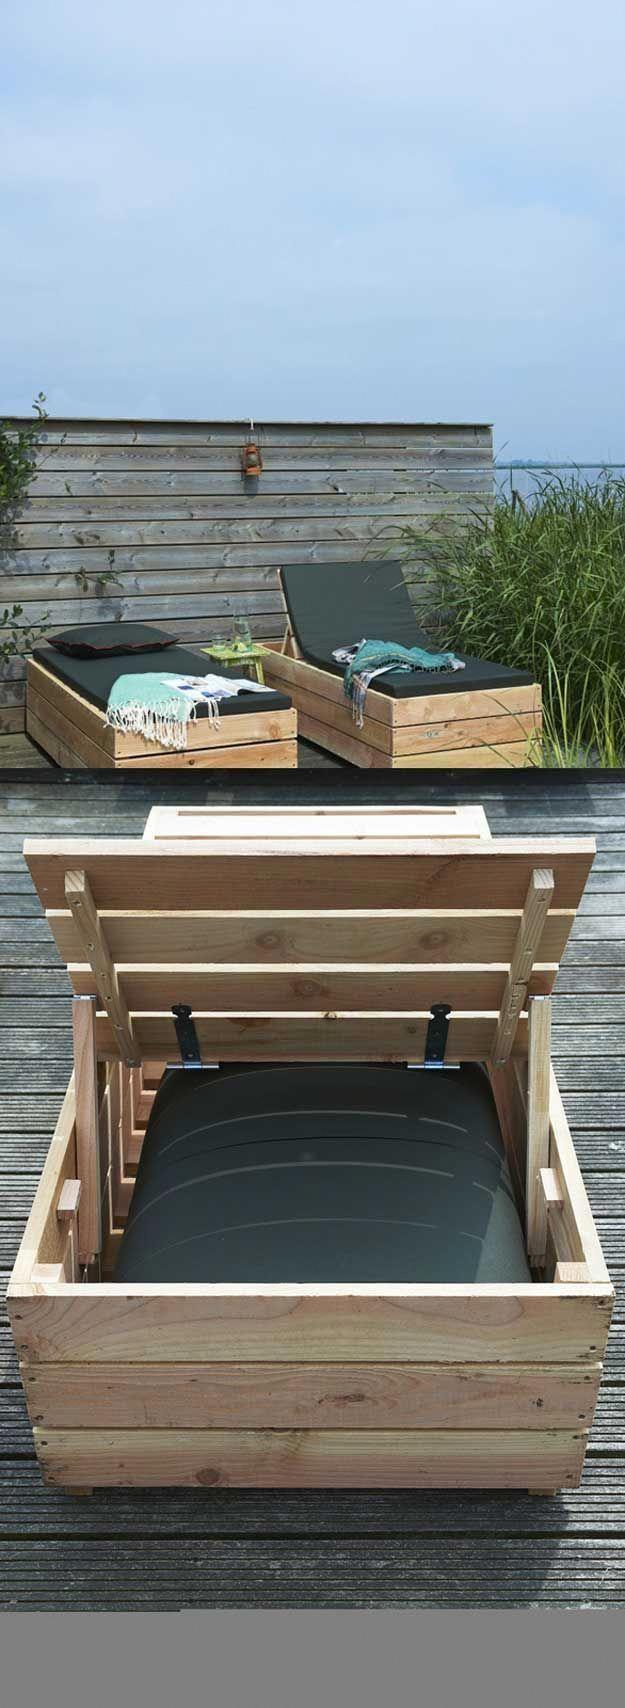 Daybed Lounger Diy Outdoor Pallet Furniture Projects Daybed Diy Furniture L Daybed Diy Furniture Rustikale Gartenmobel Tagesbett Mobel Aus Paletten